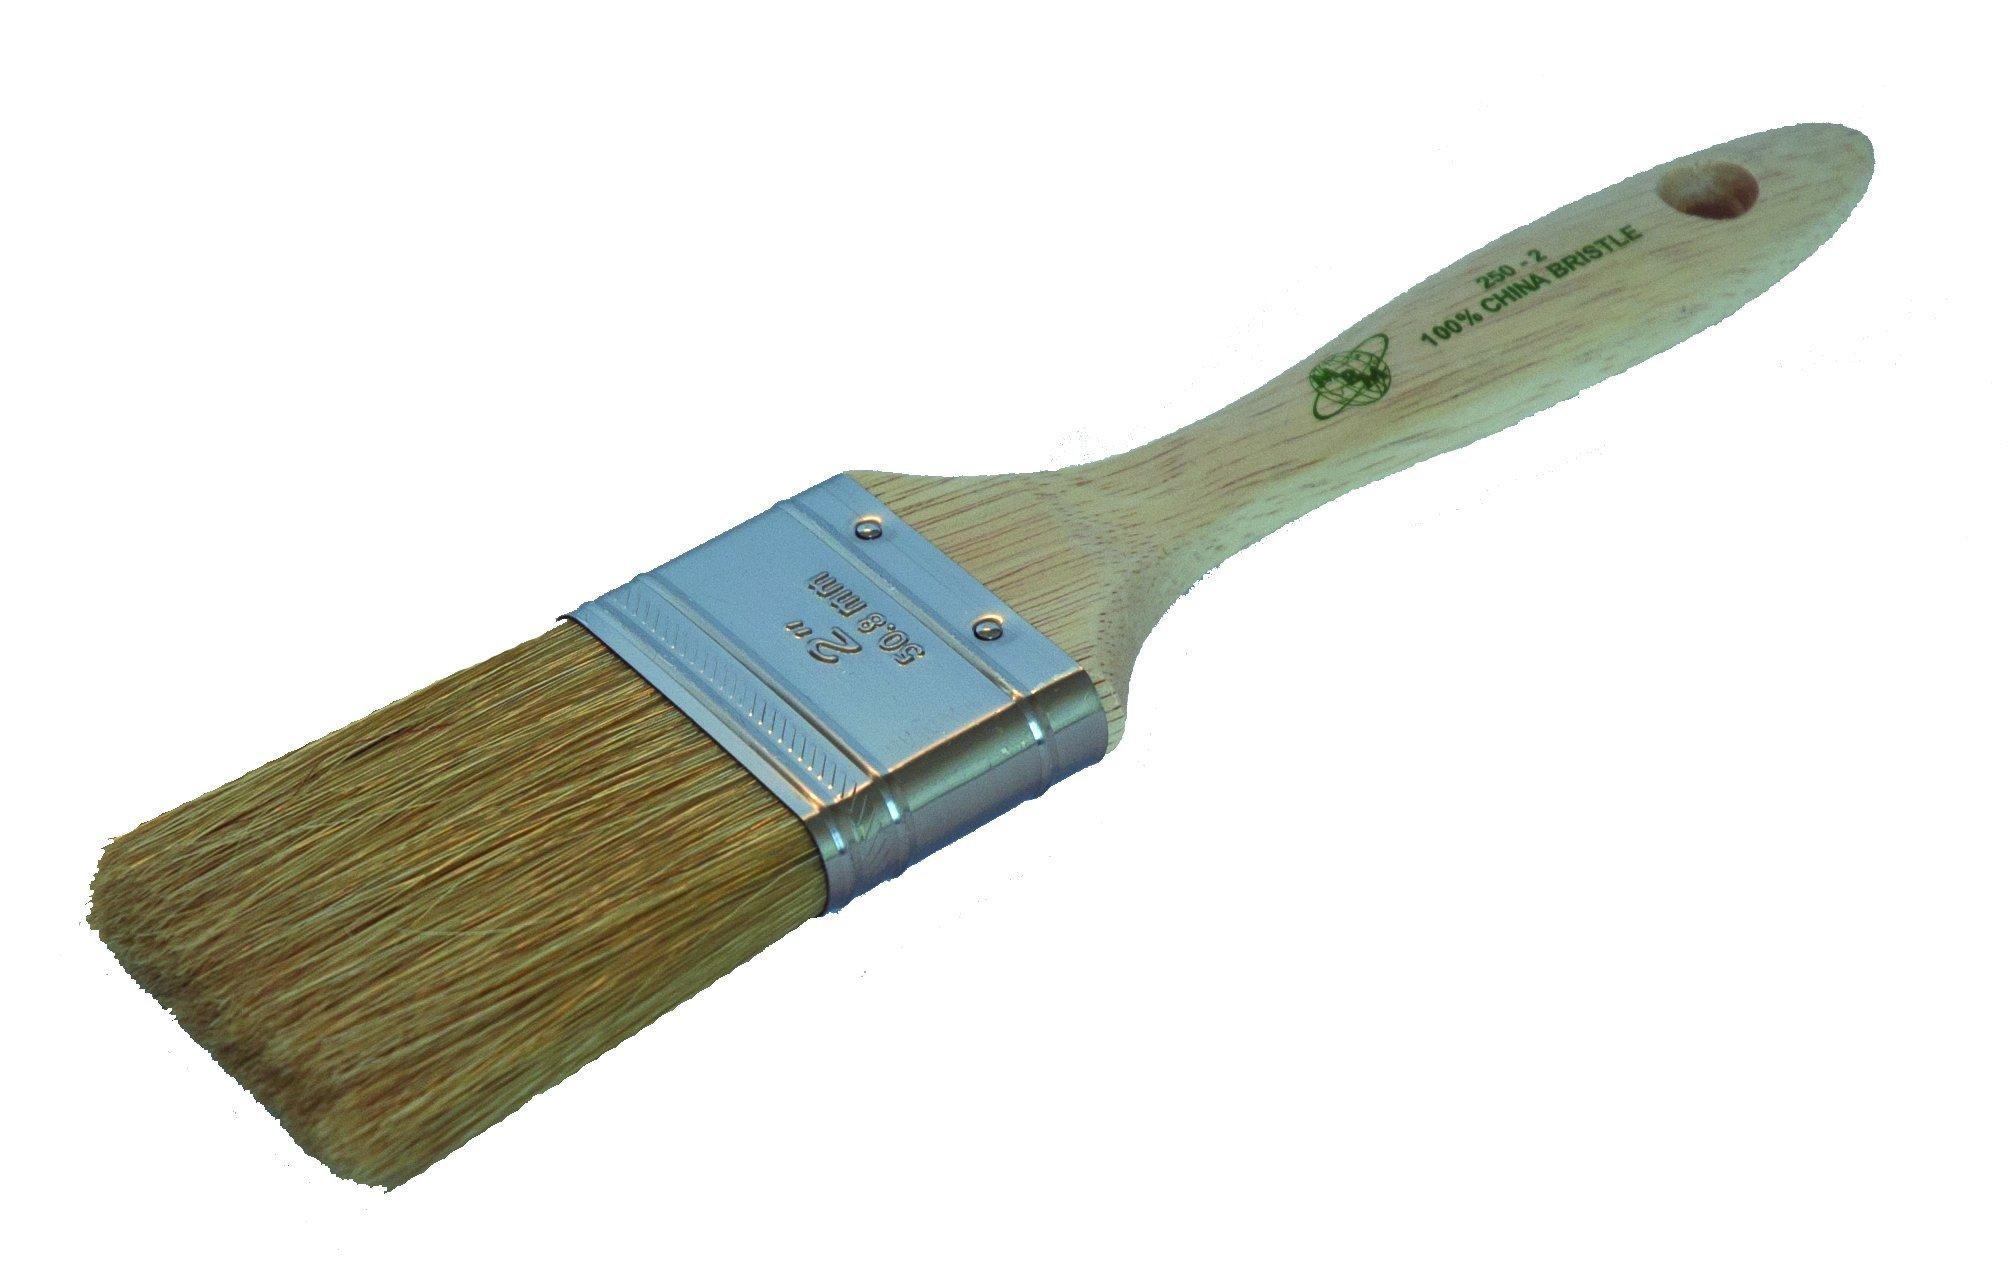 Magnolia Brush 250-1 Beavertail Paint Brush, Professional China Bristles, 1'' Bristle Width (Case of 12)